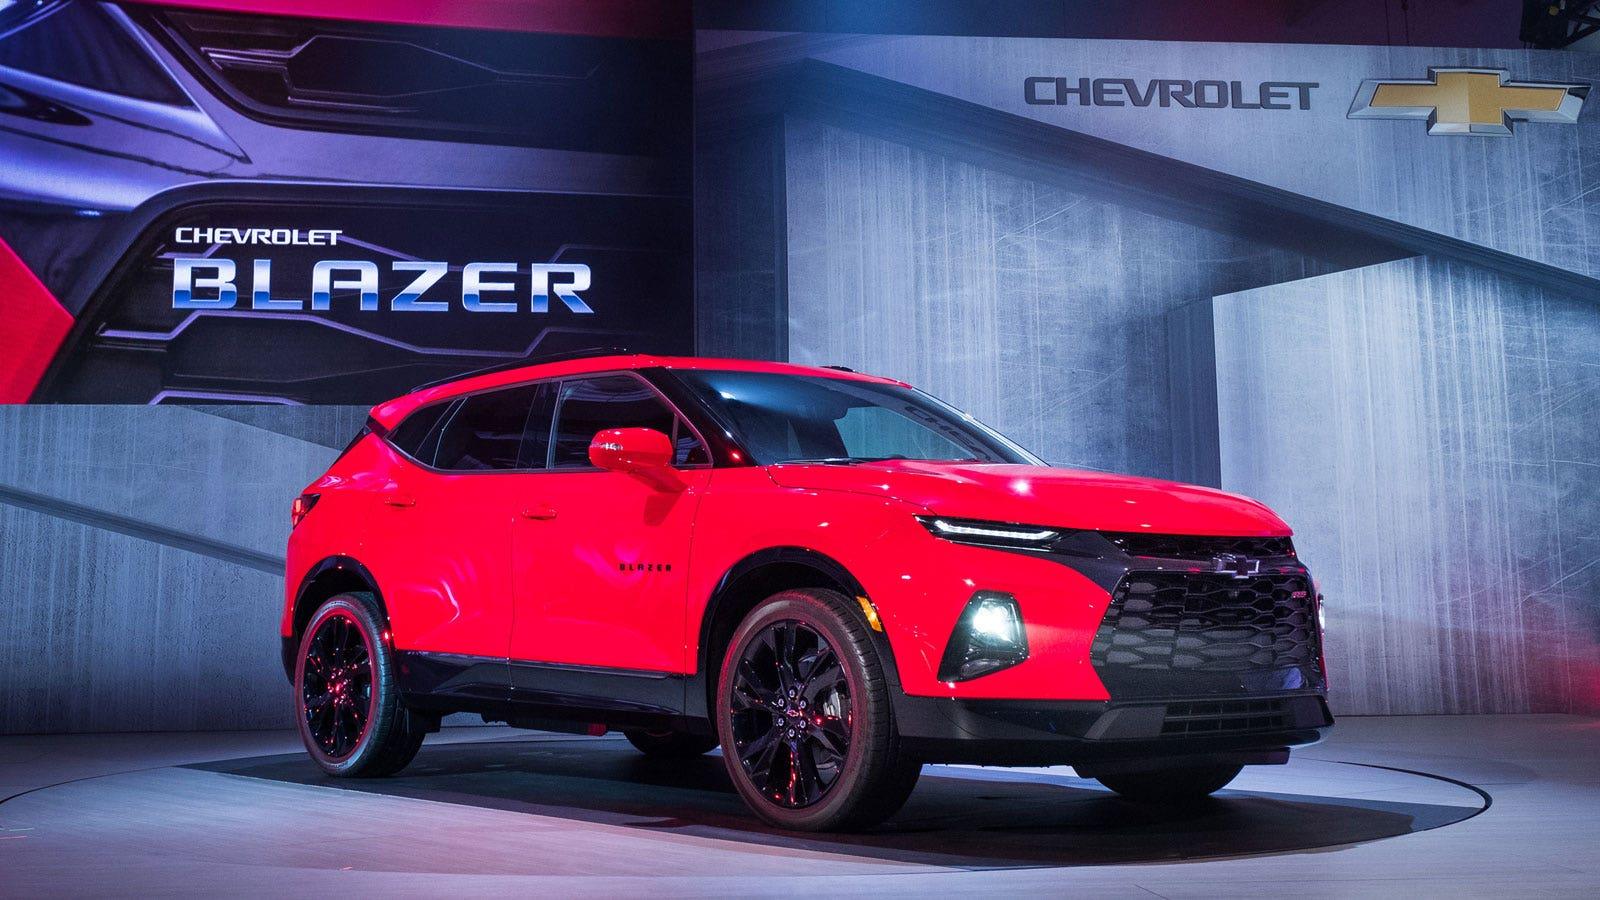 Chevy Unveils New Suv The Blazer Fox Business